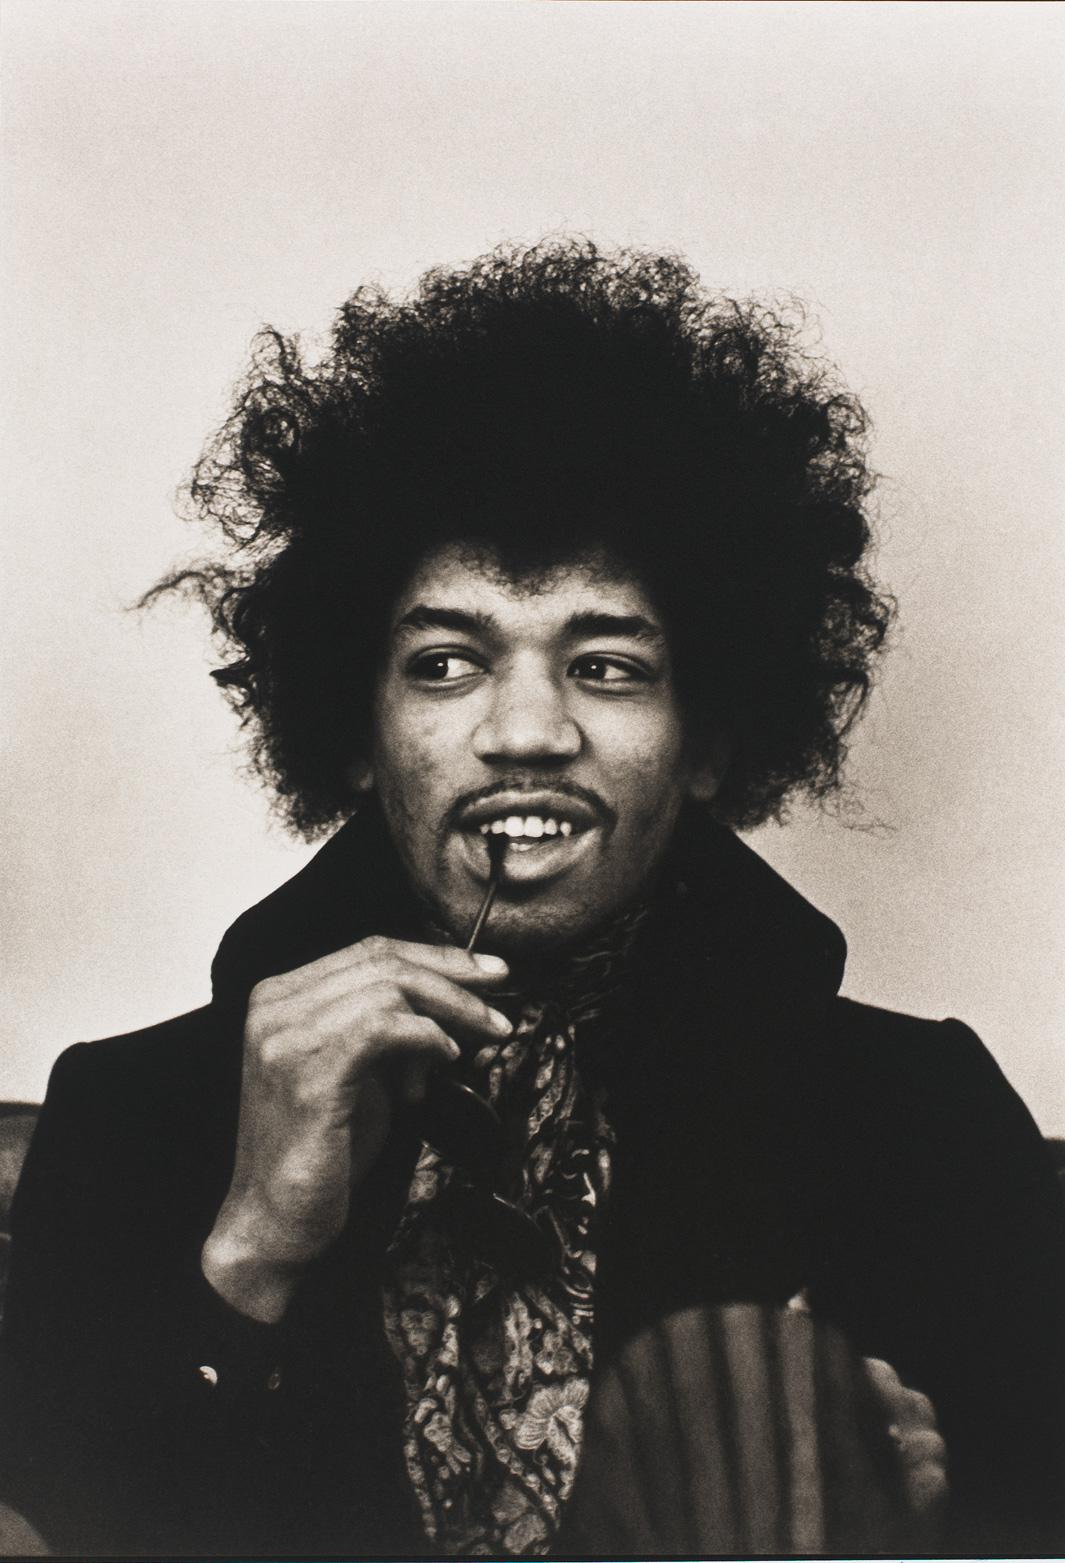 HENDRIX COLLECTION Hendrix collection We Celebrate Hendrix's Birthday With Hendrix Collection! We Celebrate Hendrixs Birthday With Hendrix Collection 1